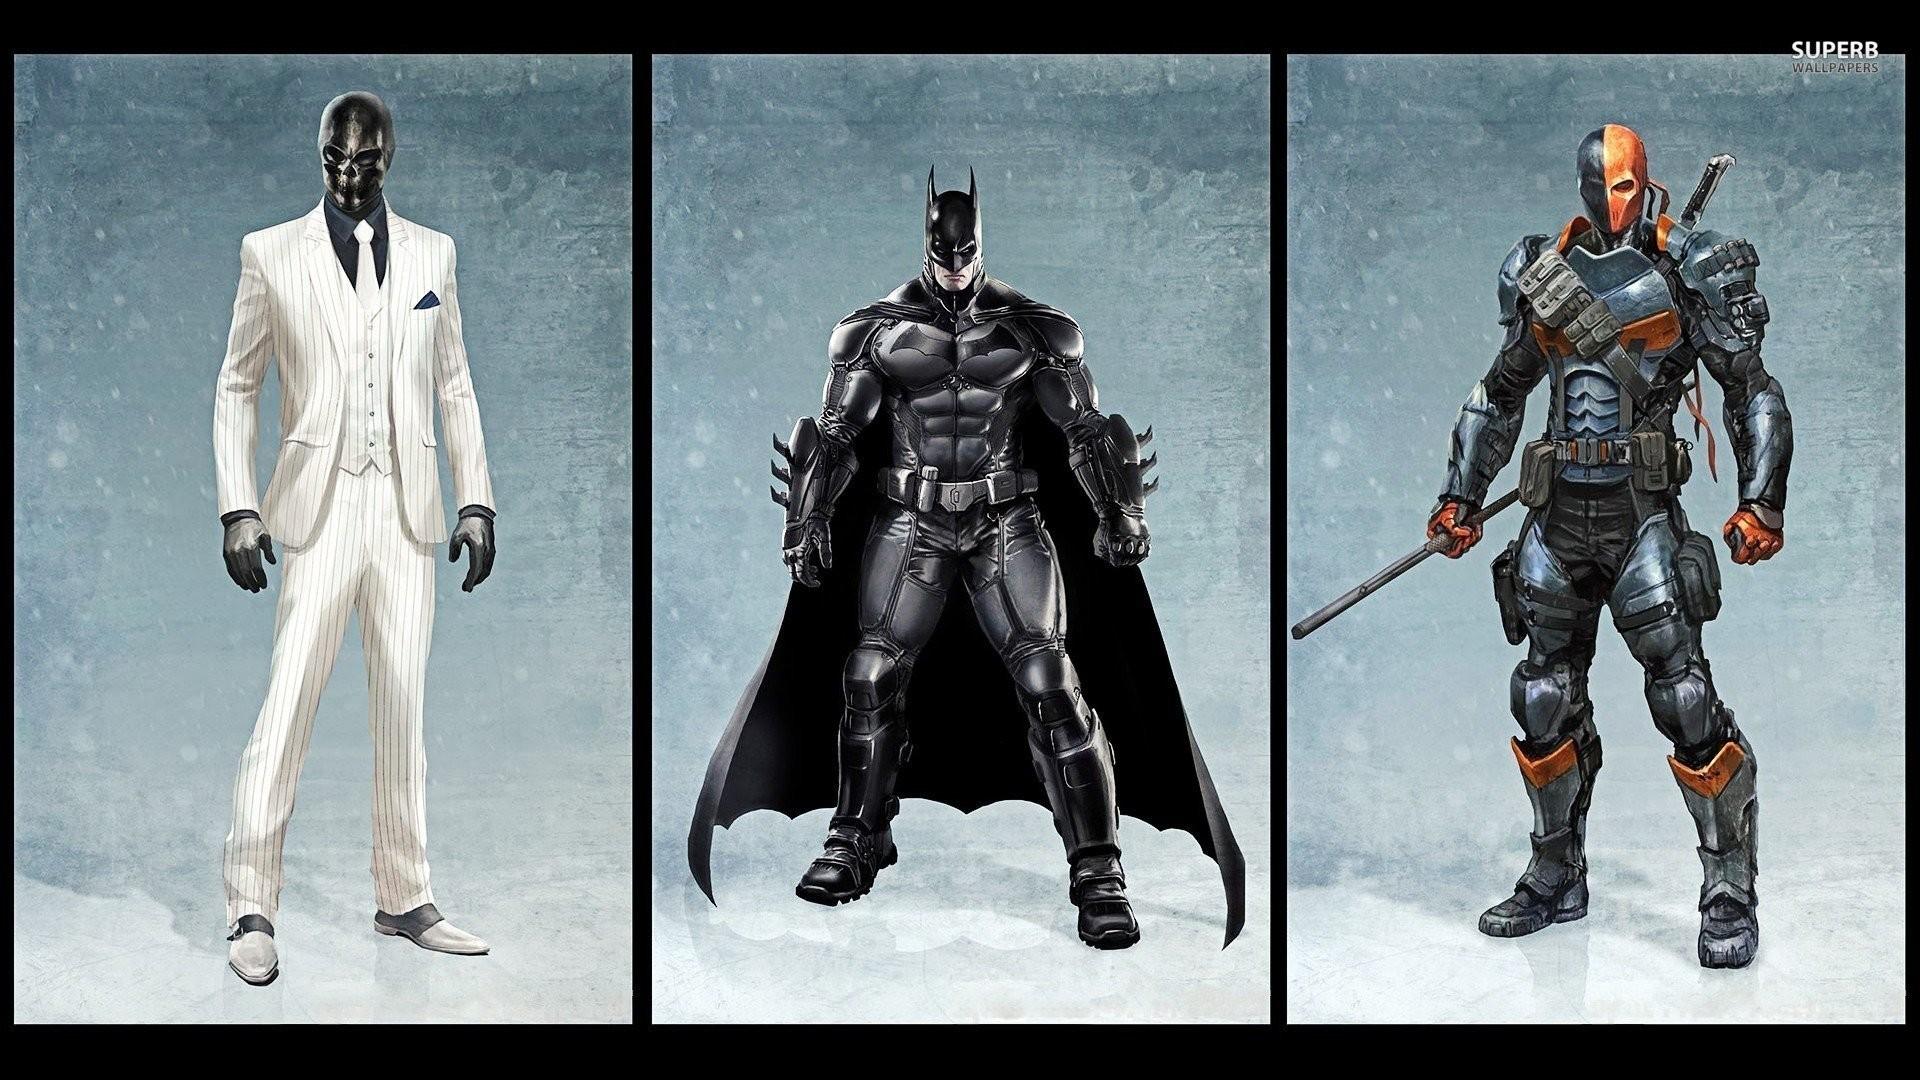 Black Mask Batman And Deathstroke – Arkham Origins 526692